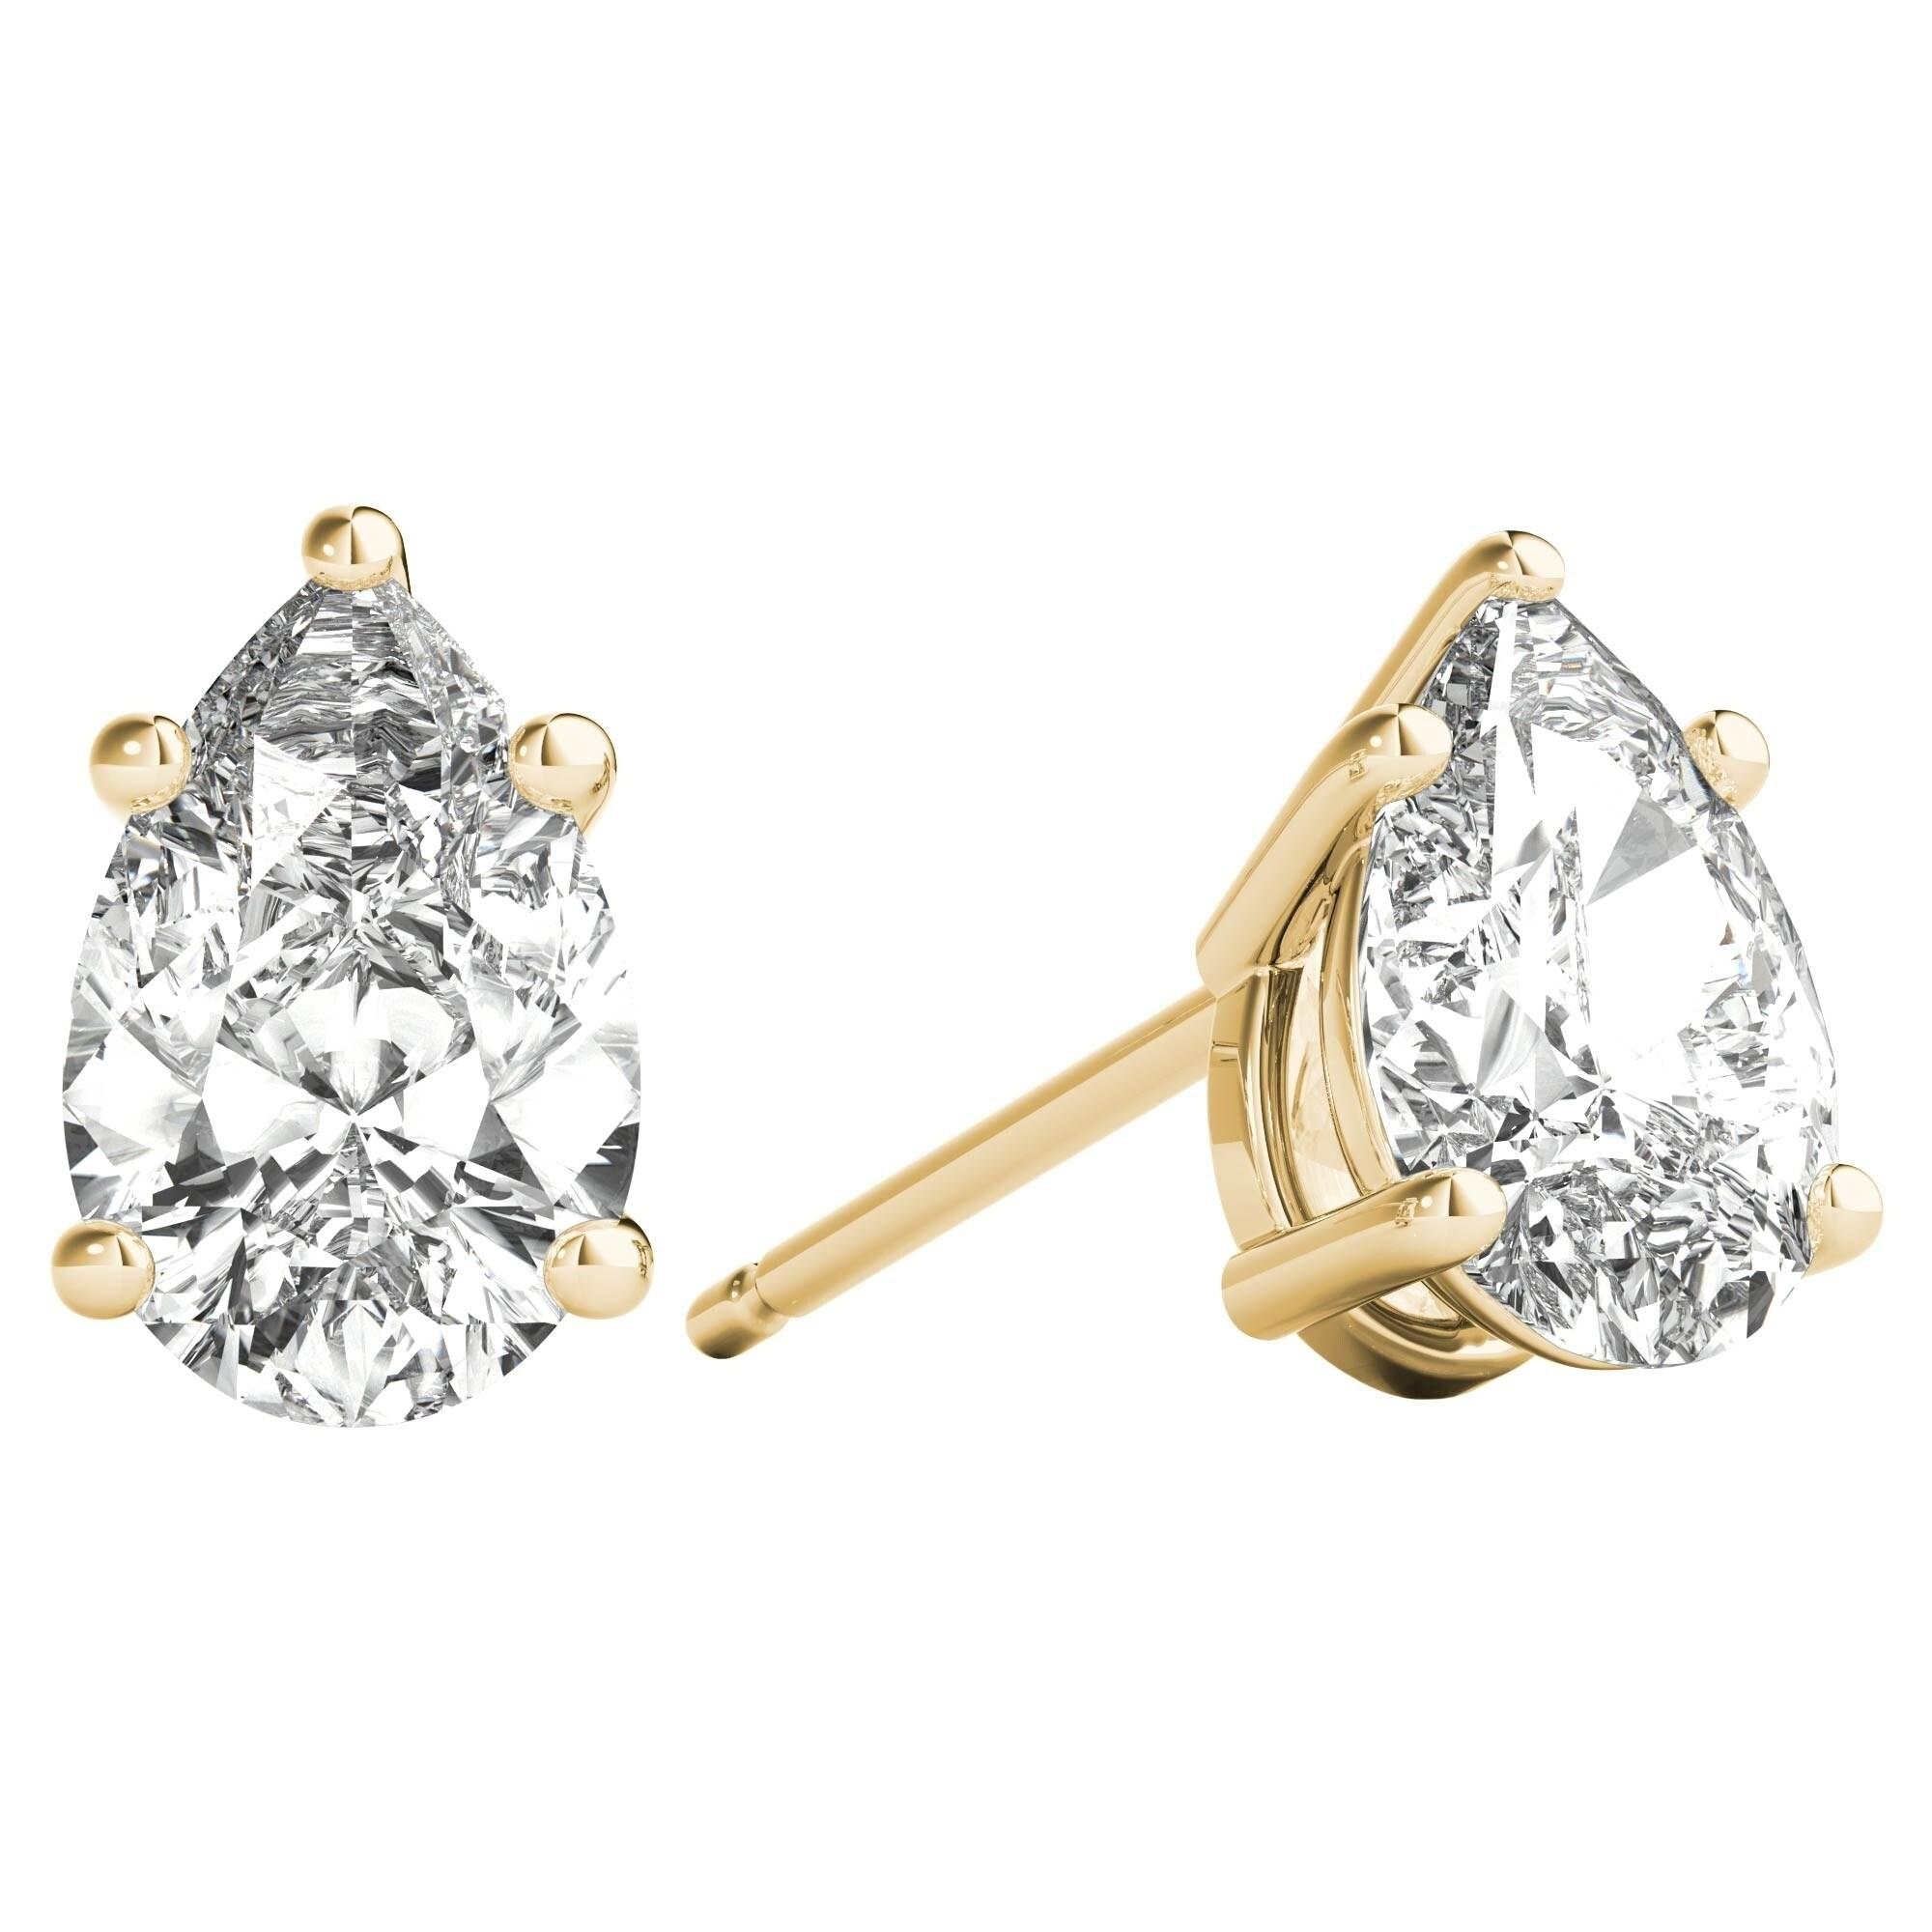 b58ec24ca Seraphina 14k Gold 0.80ct TDW Pear Cut Diamond Solitaire Stud Earrings